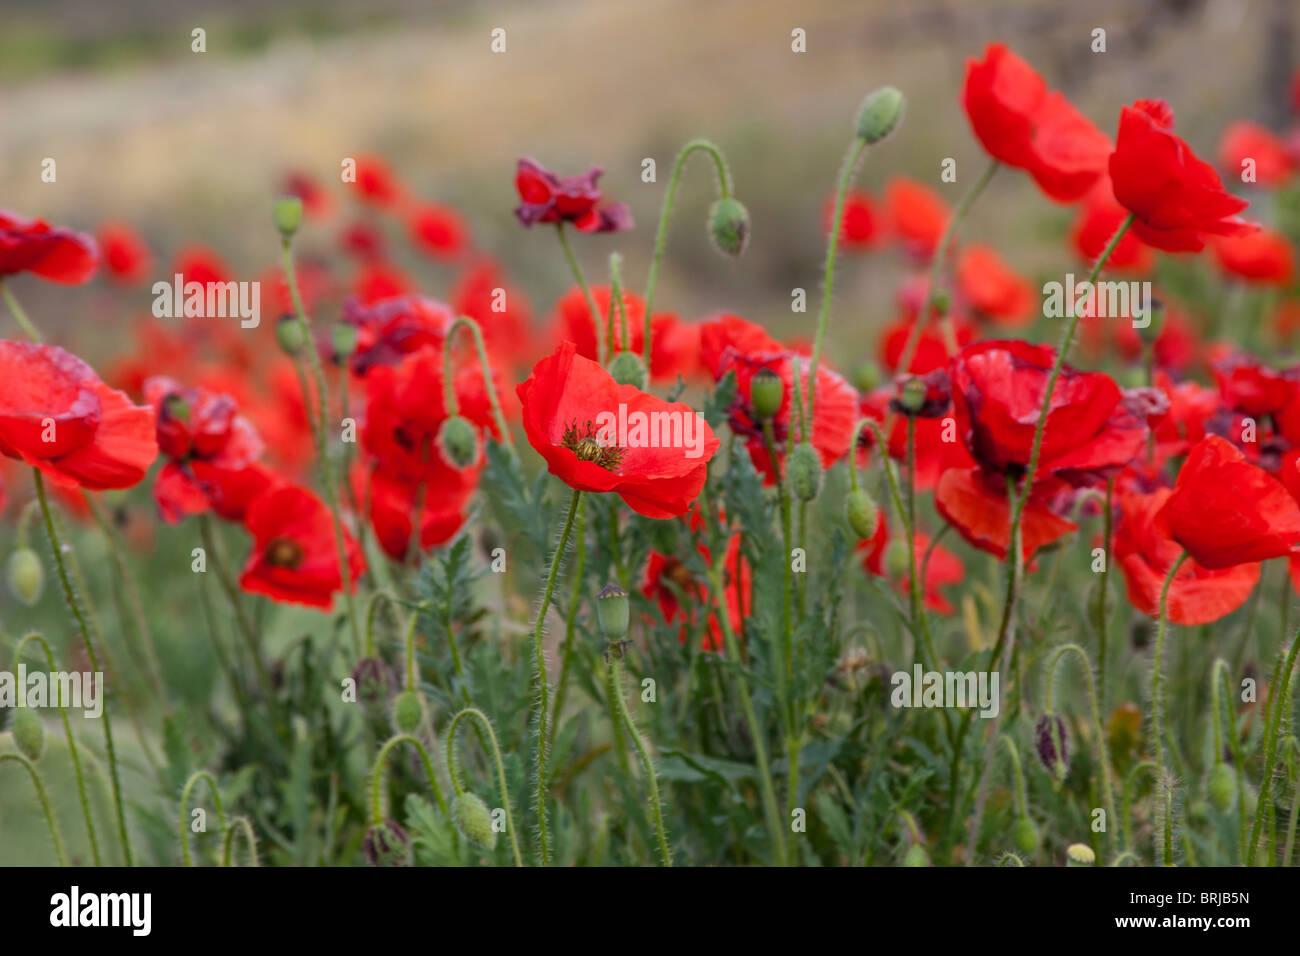 Blume bunt bunte roten Mohn Wildblumen wild Stockbild